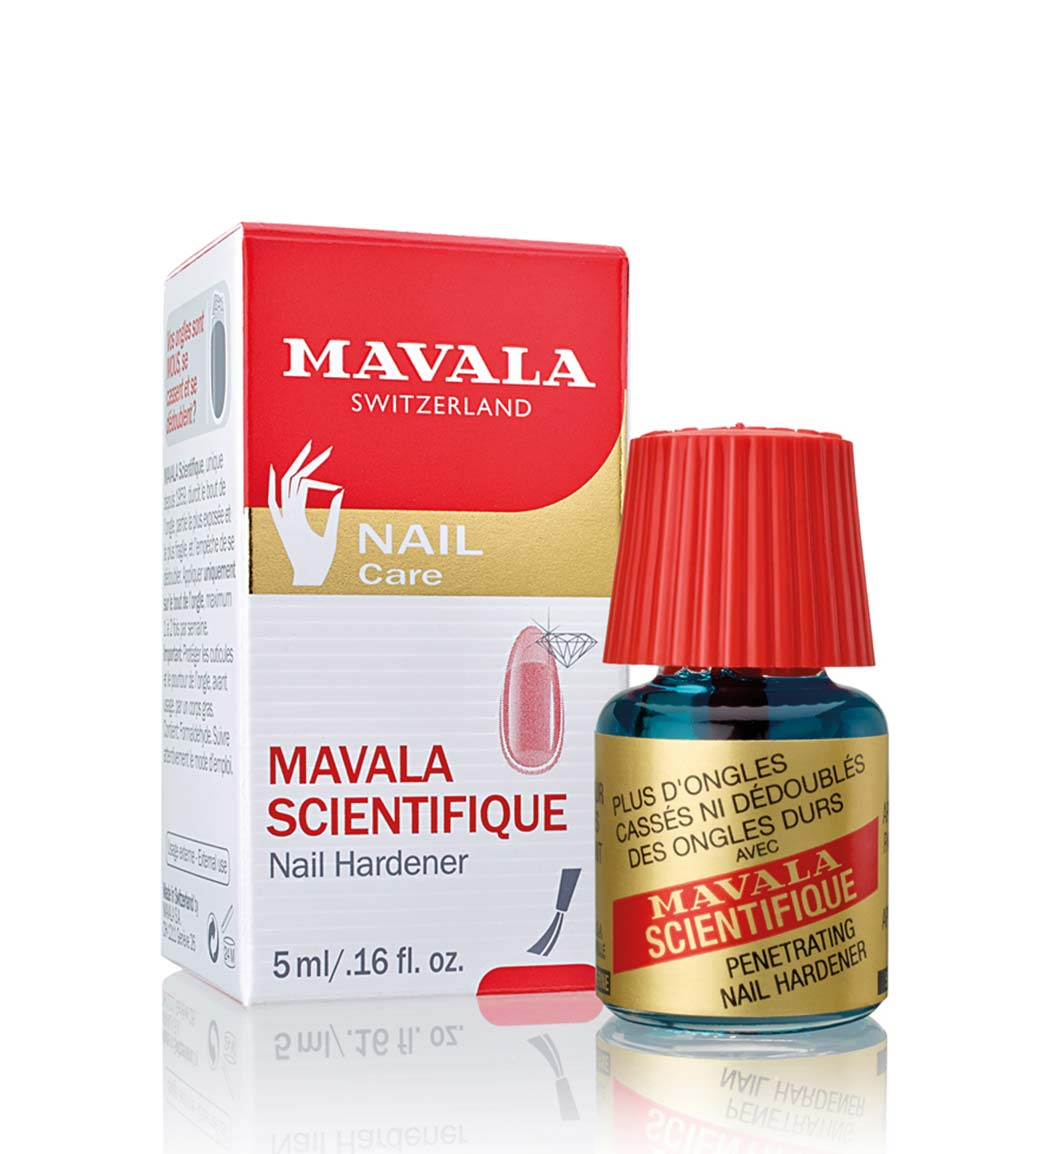 محلول استحکام بخش ناخن Scientifique Nail Hardener ماوالا ۵ میل